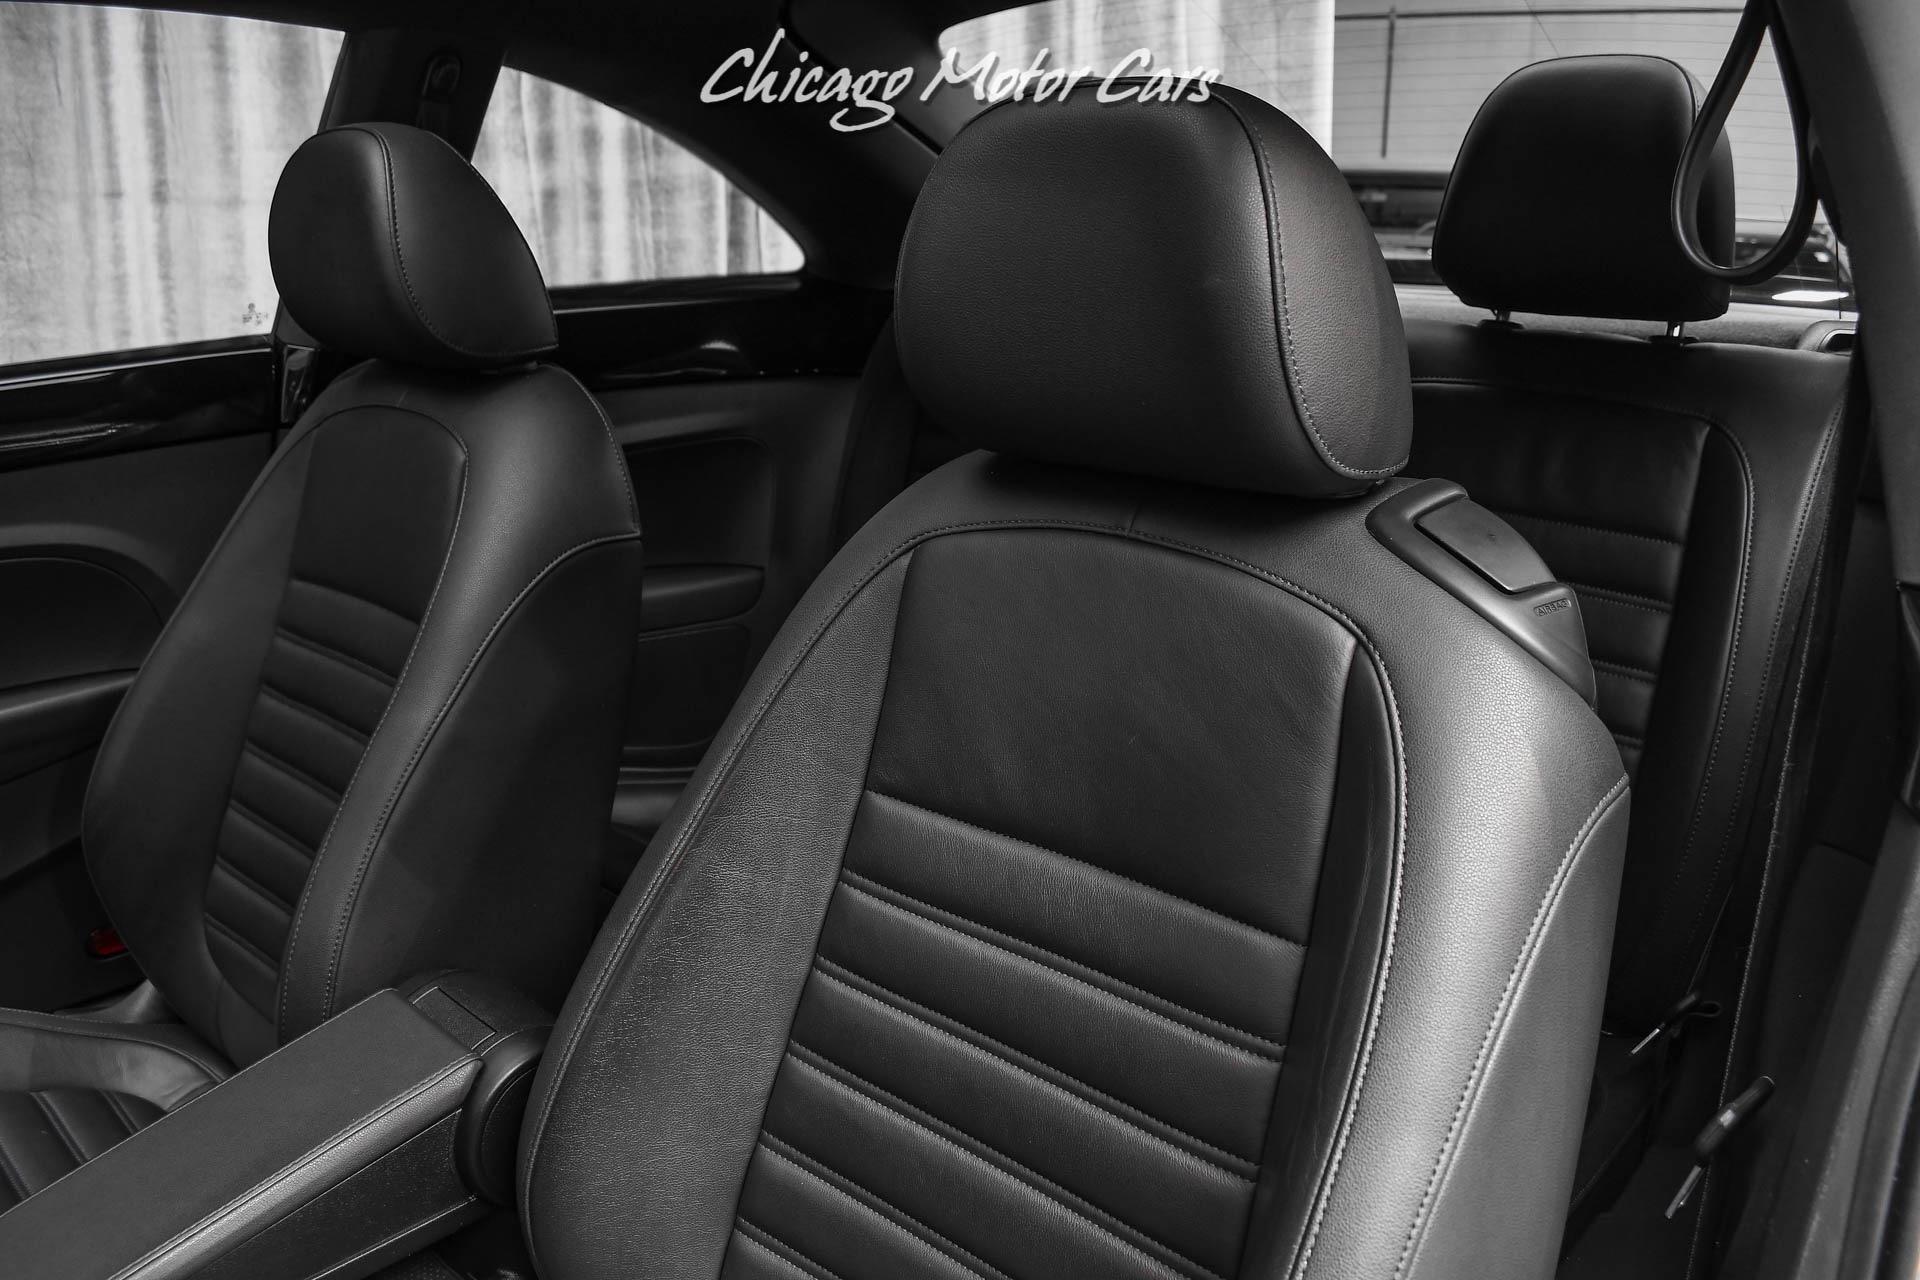 Used-2014-Volkswagen-Beetle-R-Line-PZEV-Leather-Sunroof-Navigation-Fender-Audio